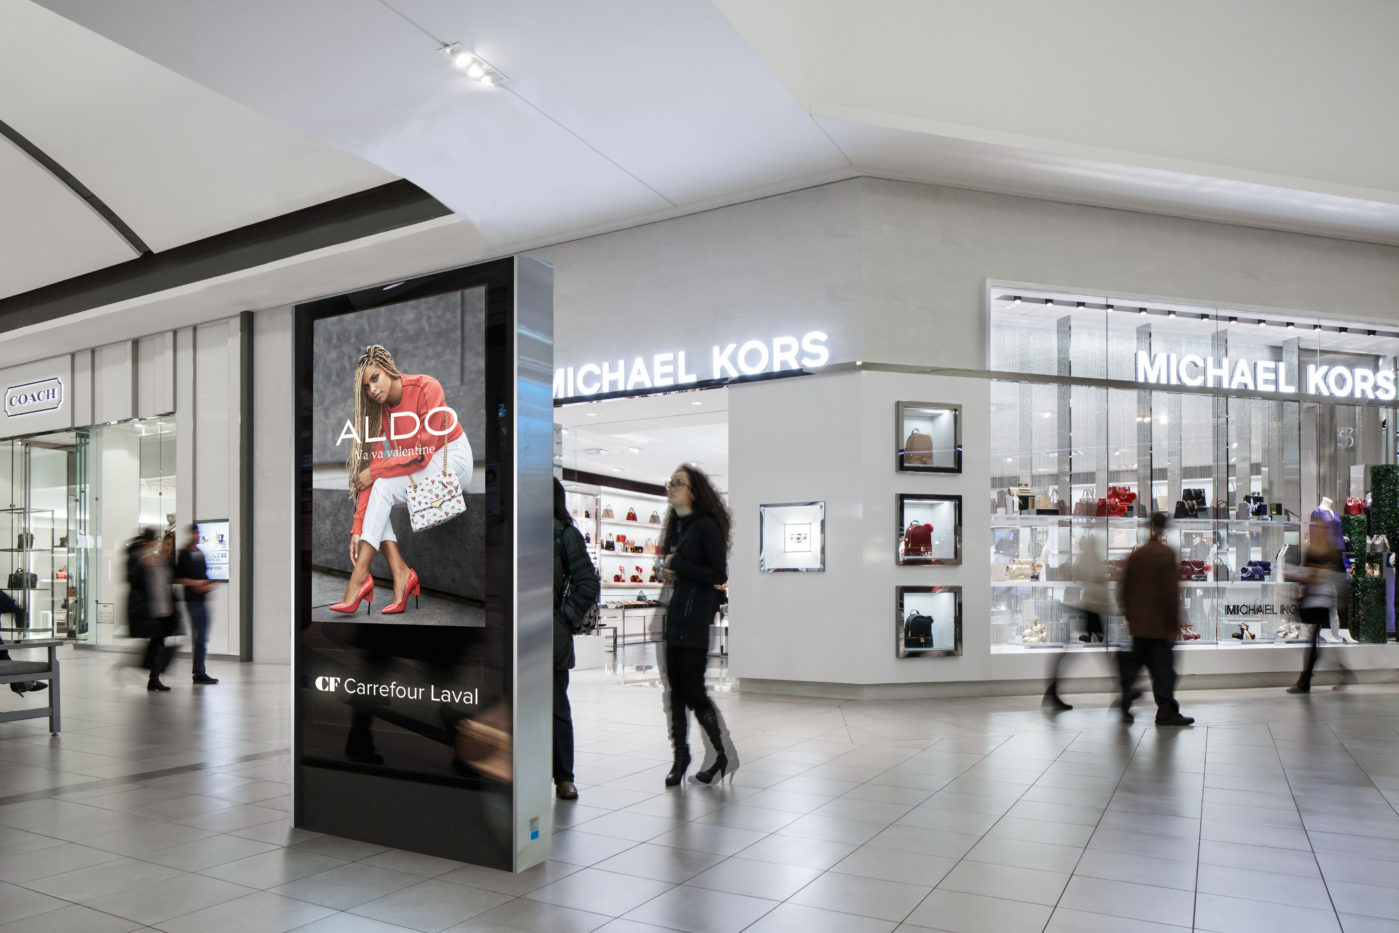 Aldo - Malls - CF Carrefour Laval - Digital Directory (Laval, Quebec)